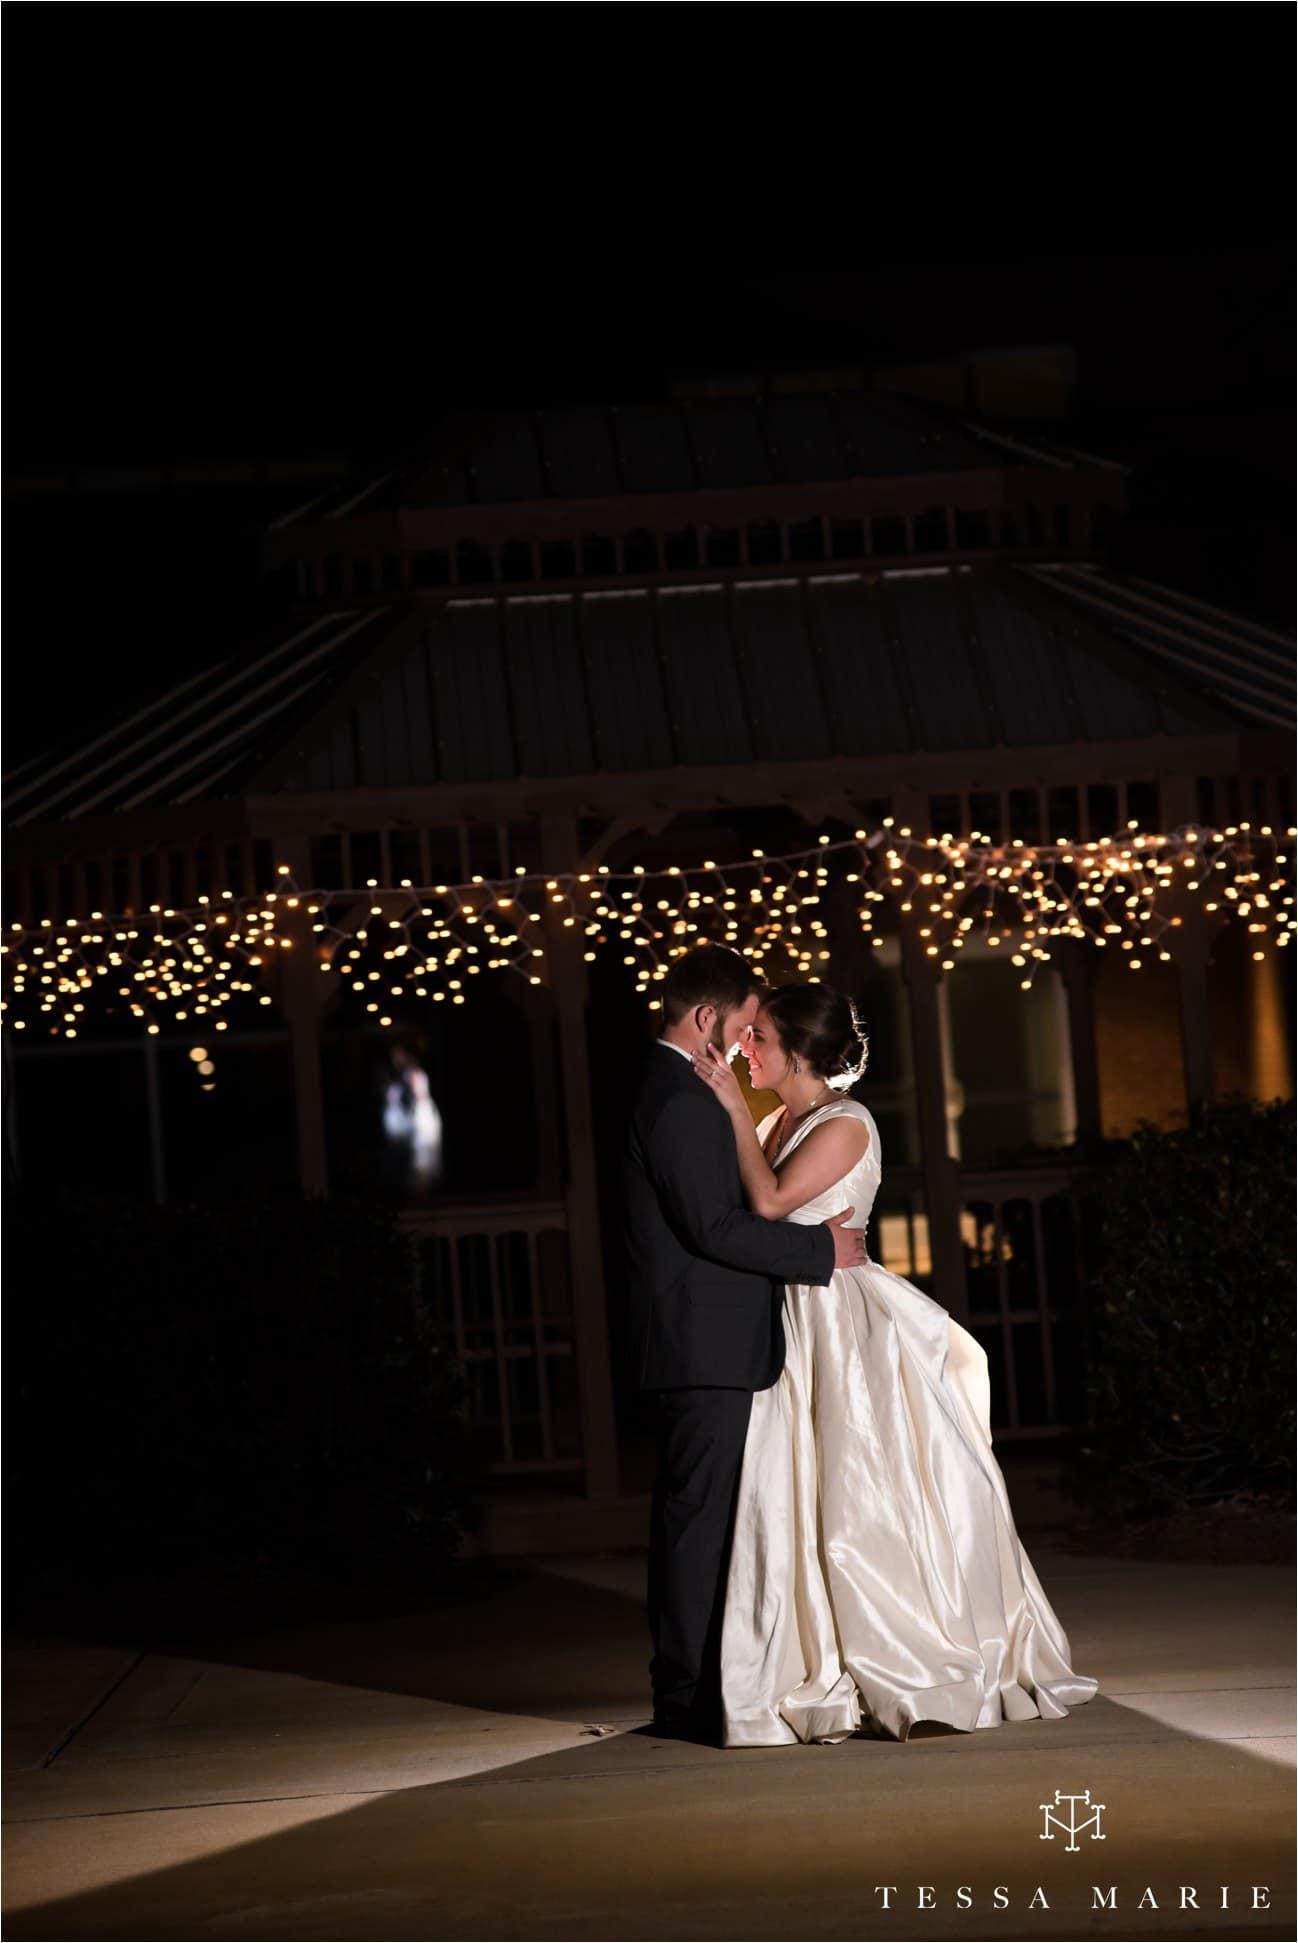 tessa_marie_weddings_wedding_moments_Tessa_marie_studios_0162